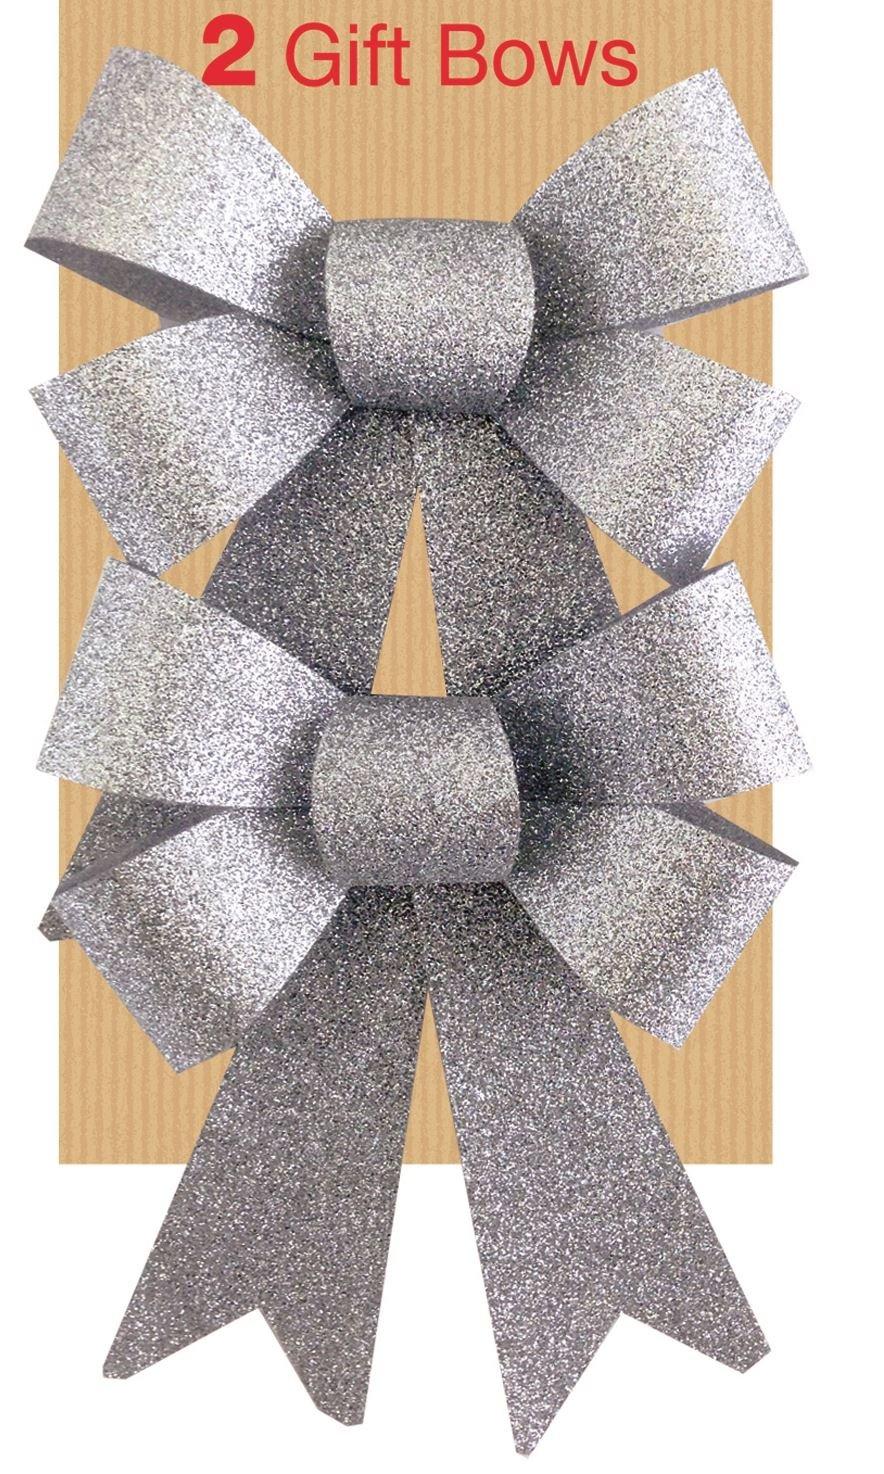 2 Silver Glitter Ribbon Bows Christmas Decoration Present Family Celebration Christmas Tree Festive Birthday Wedding Wrapping Hampers Concept4u